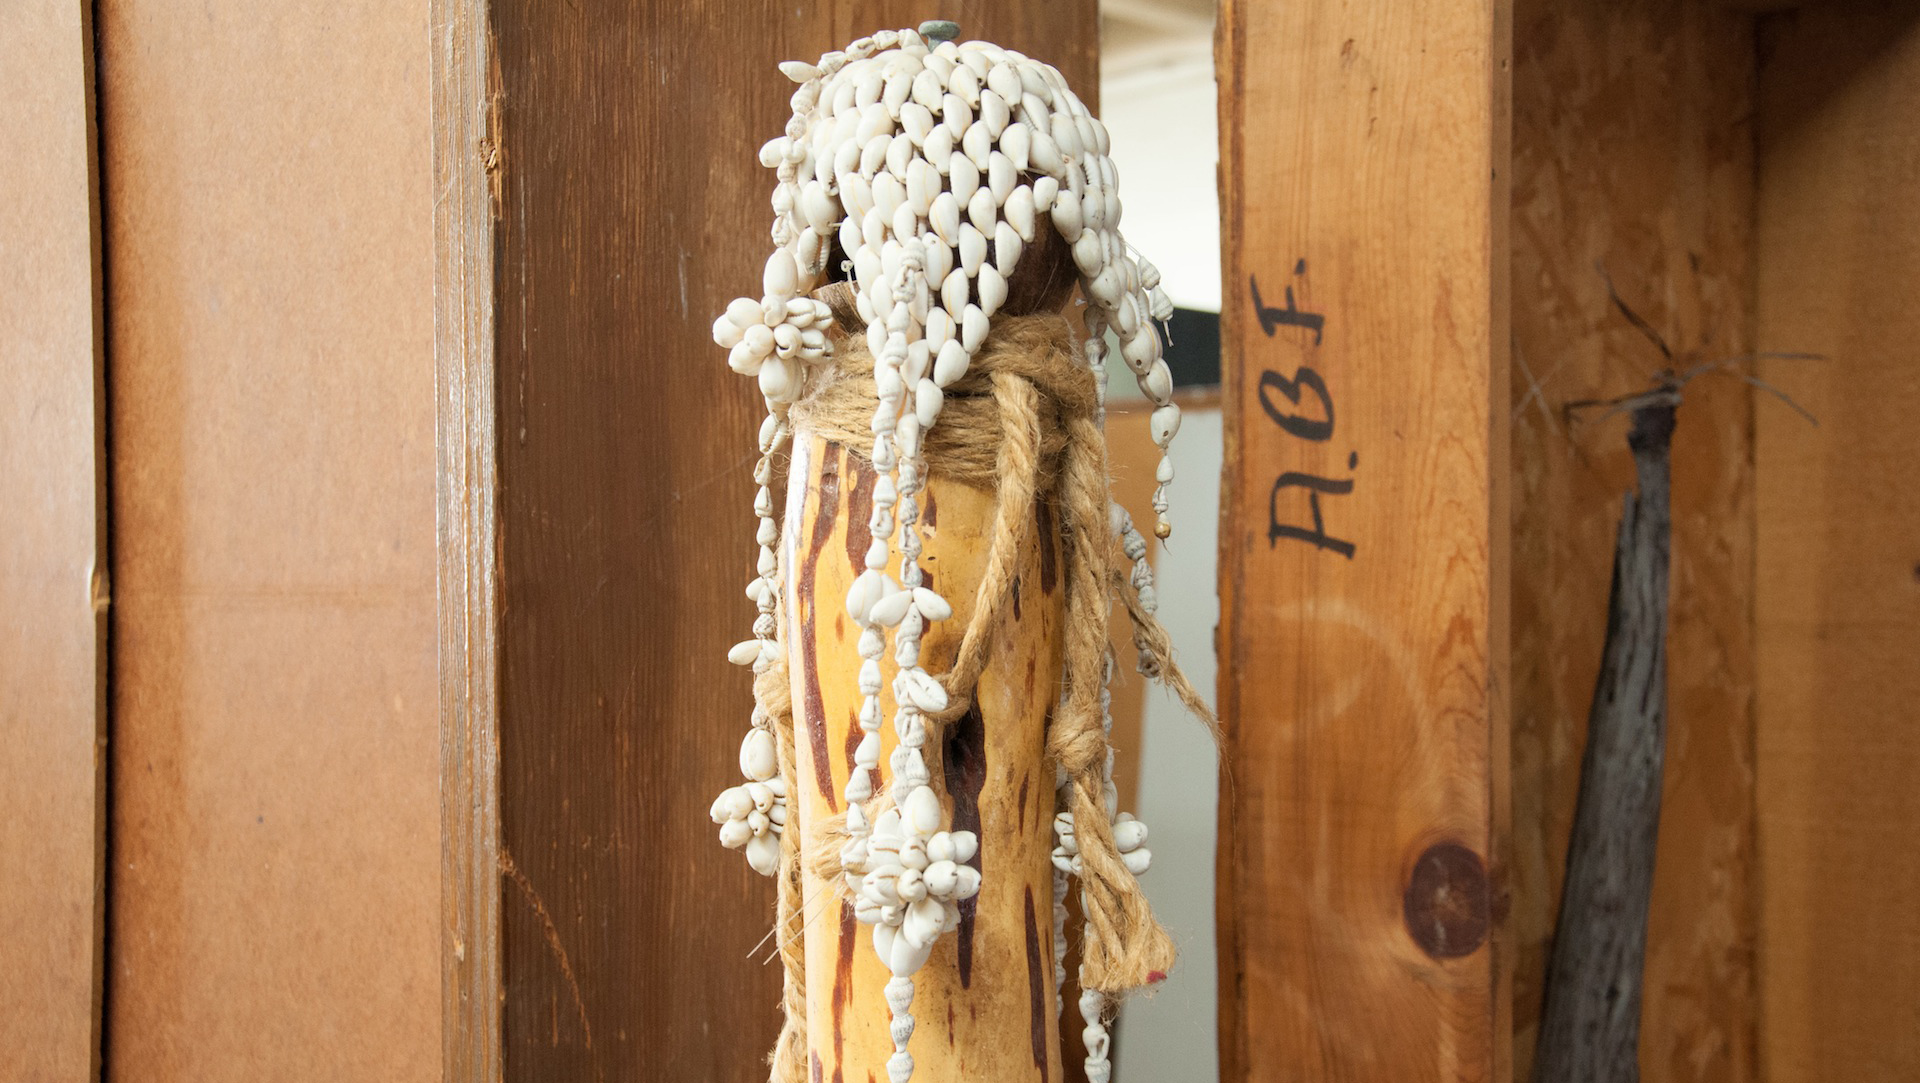 Shiokava macramé and wood totem